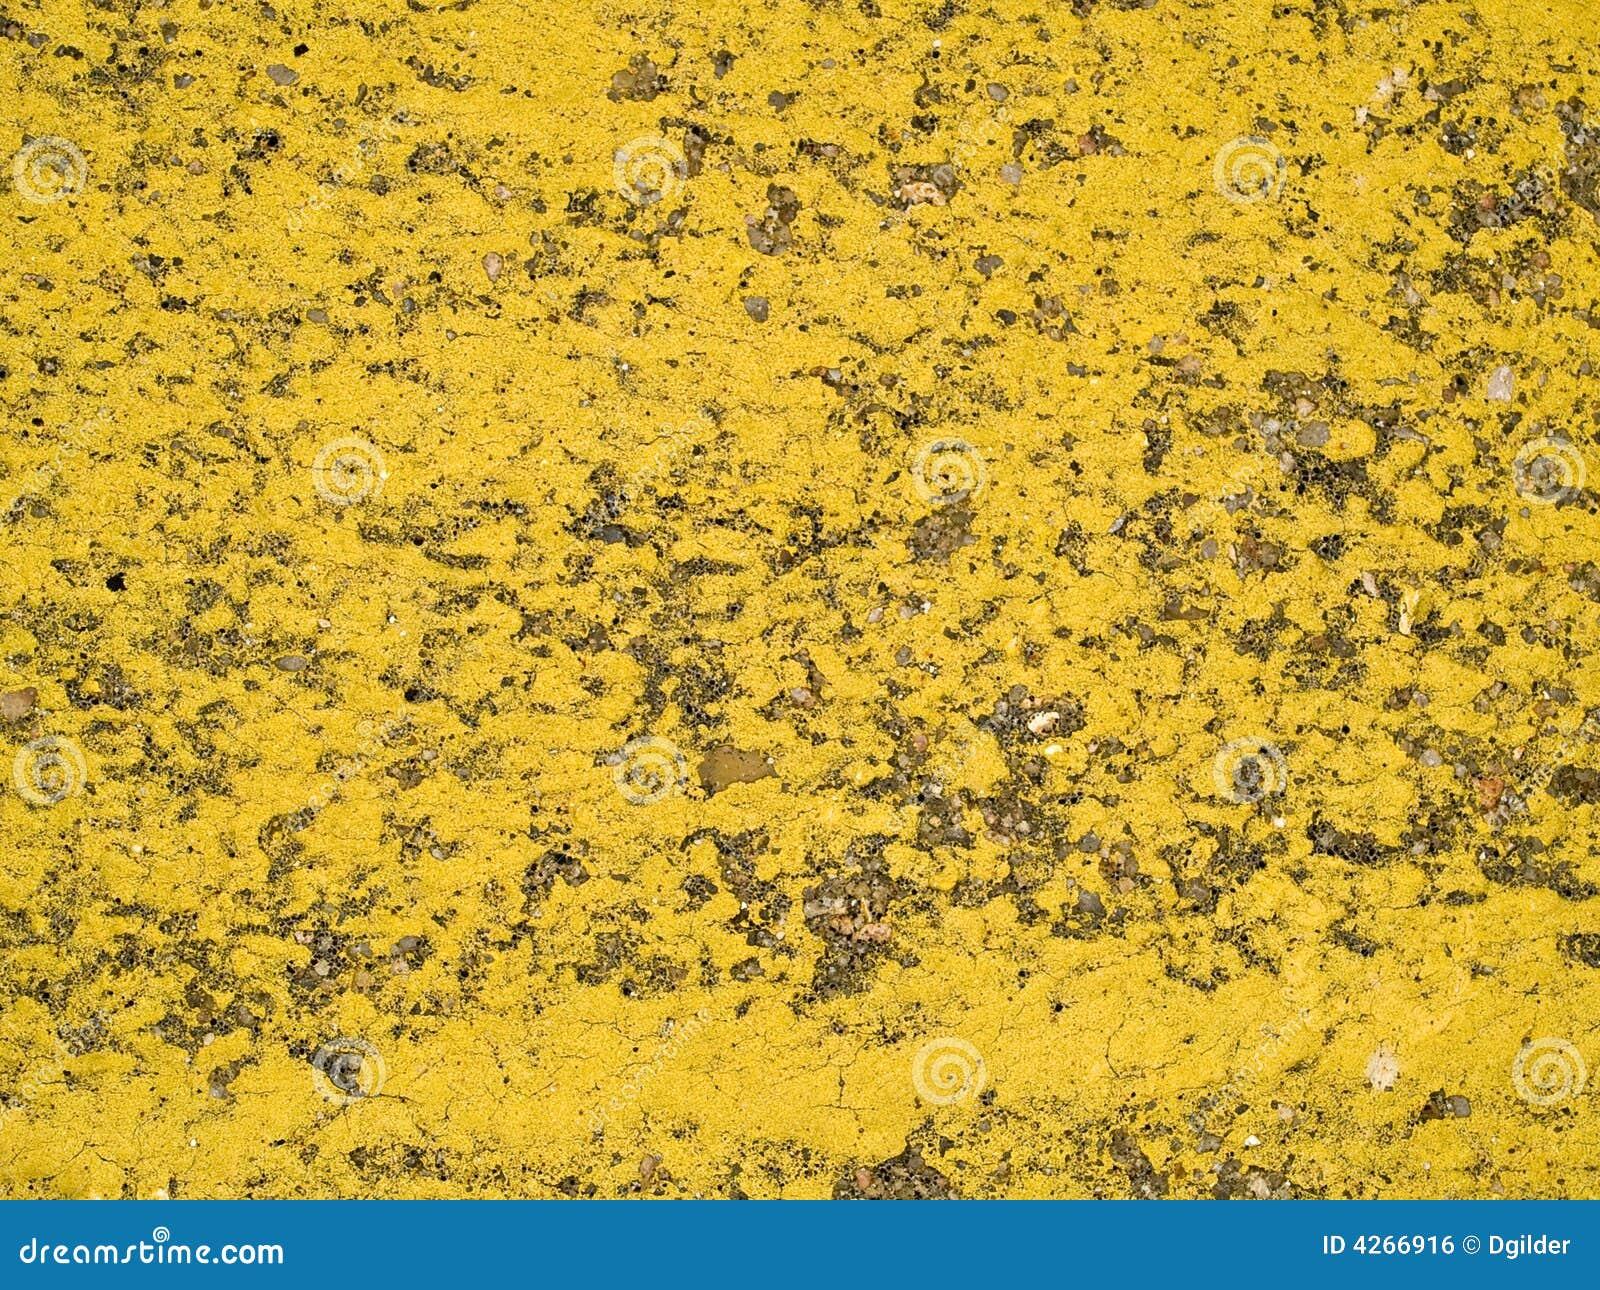 Line Texture Paint : Texture yellow road paint stock photo image